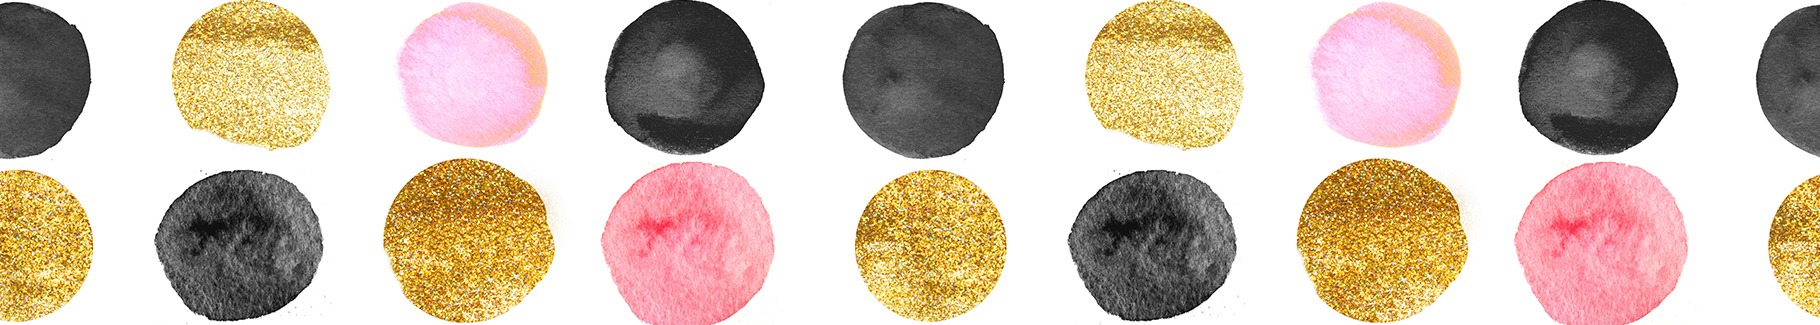 Kolorowa fototapeta kropki